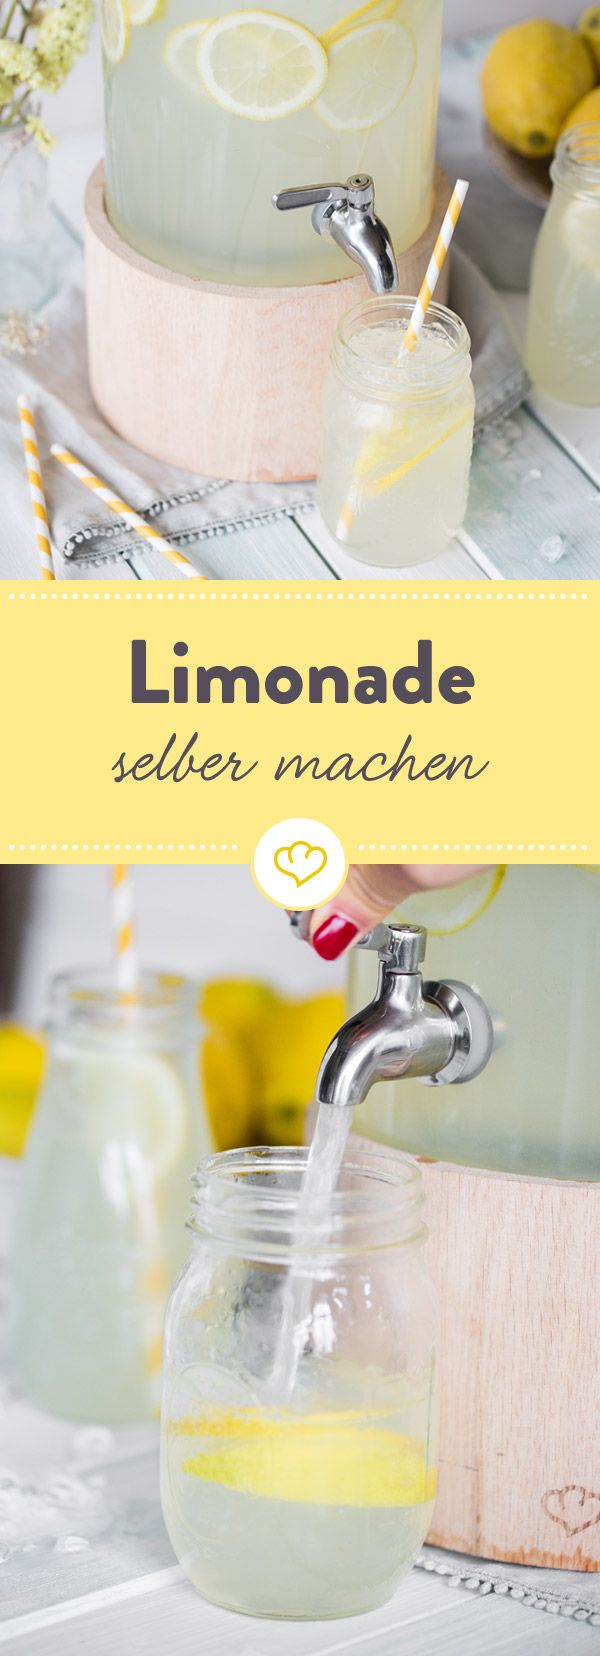 Zitronenlimonade selber machen - das Grundrezept #melonrecipes